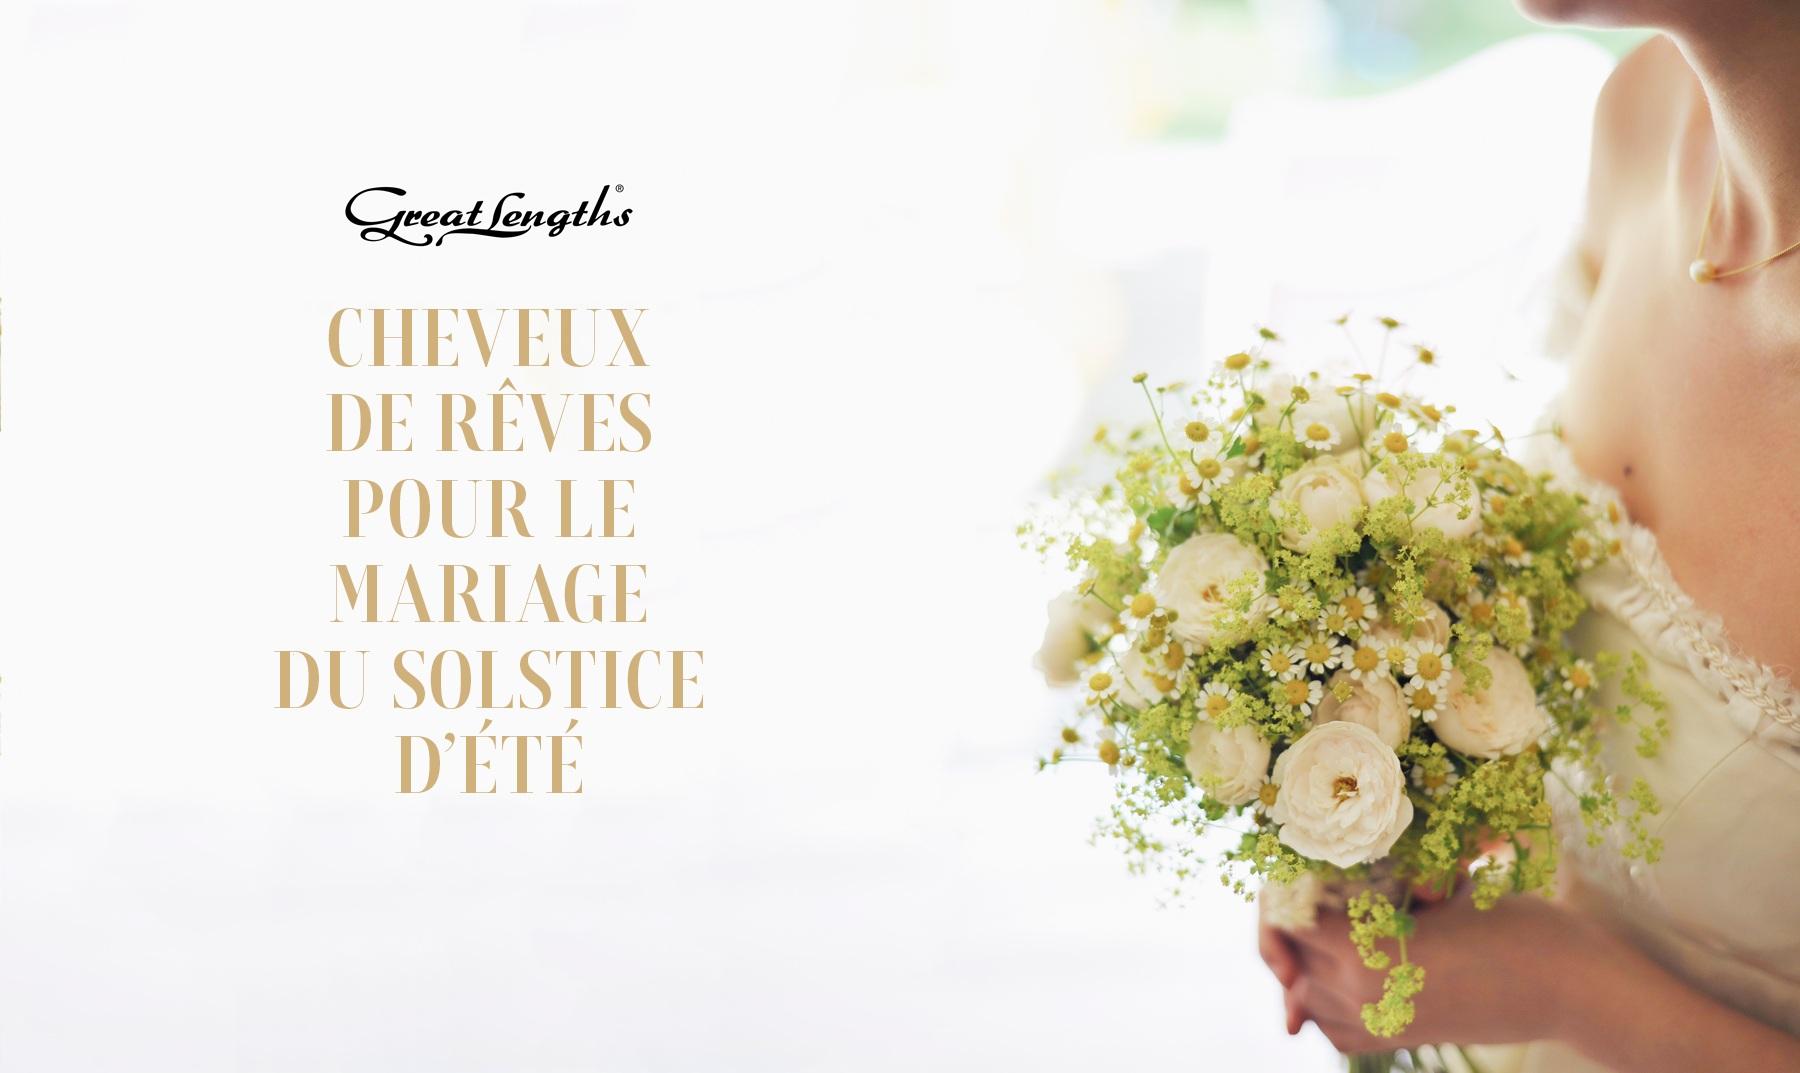 GL-SummerNewsletter-WeddingHair-BlogHeader-FR.jpg